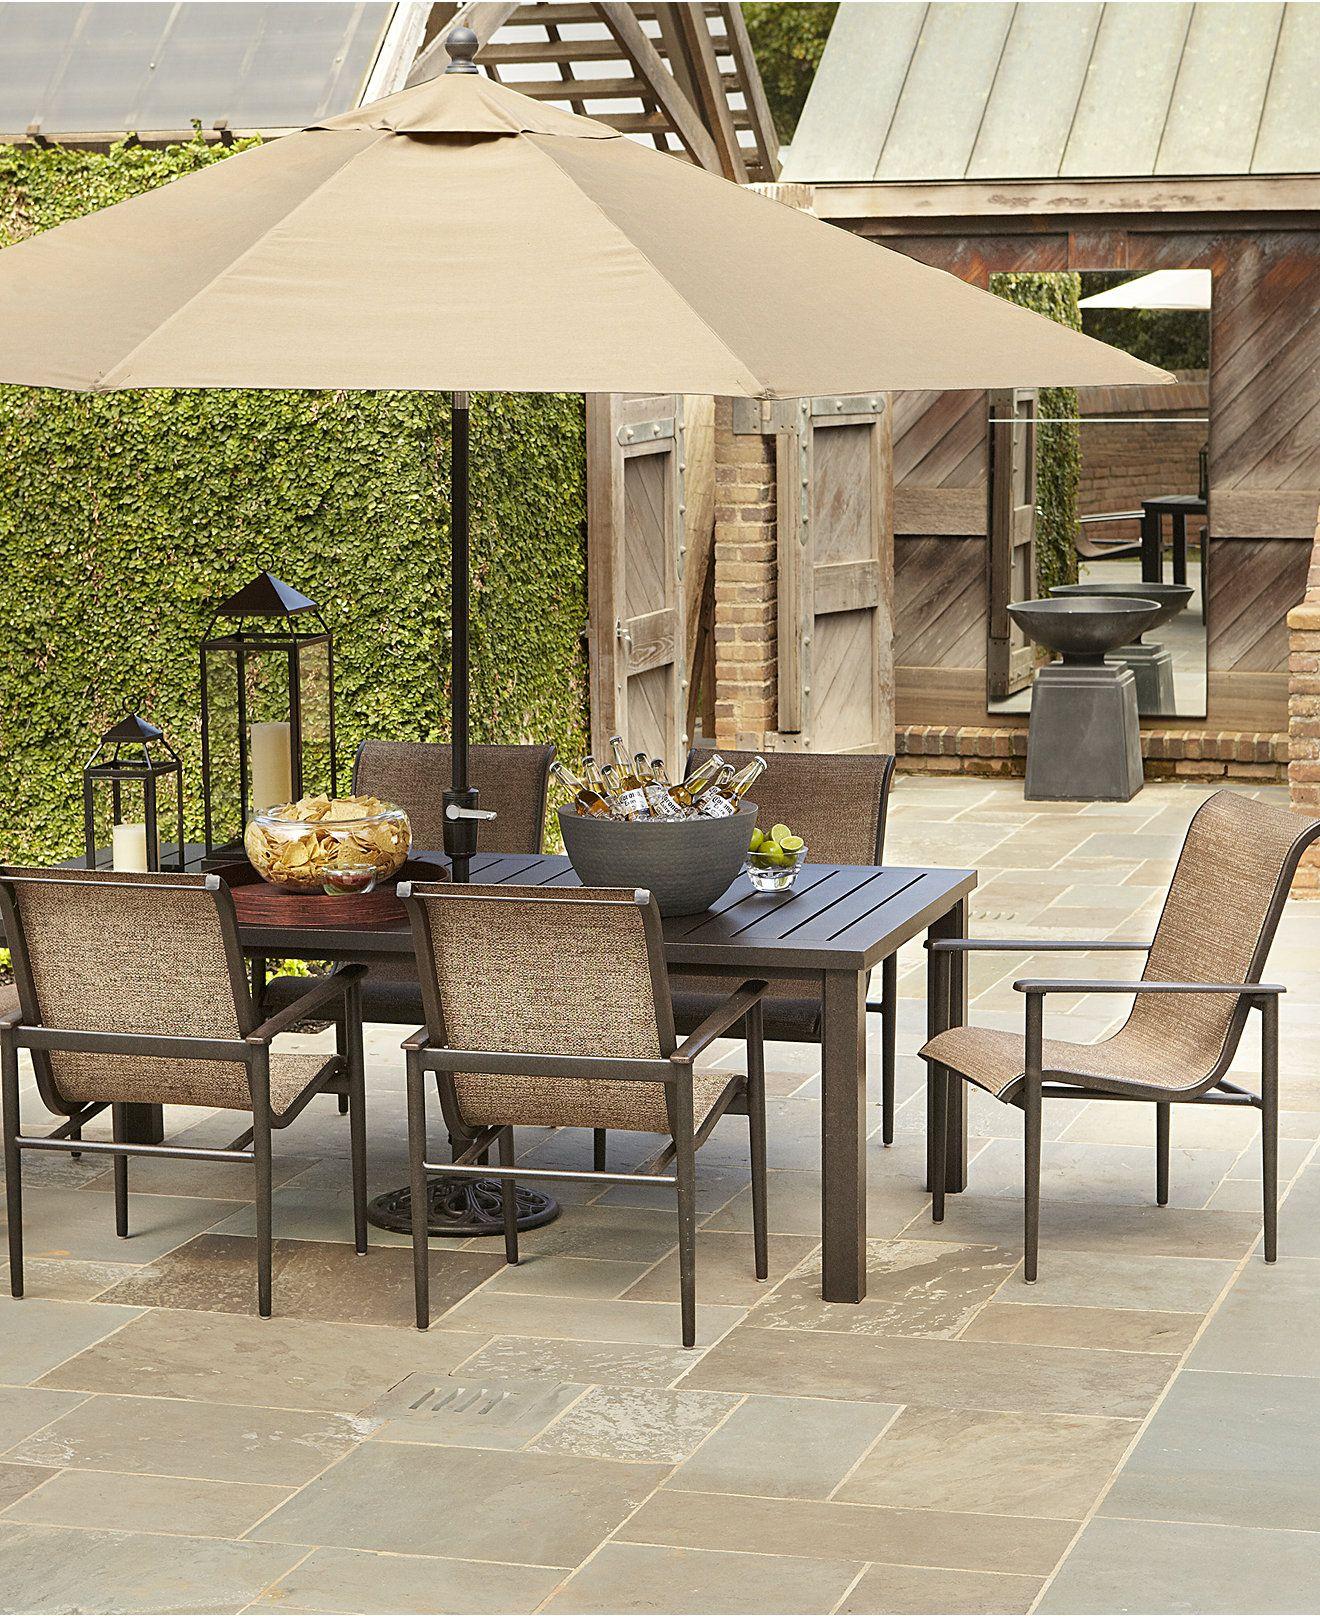 Badgley Outdoor Patio Furniture Dining Sets & Pieces -84